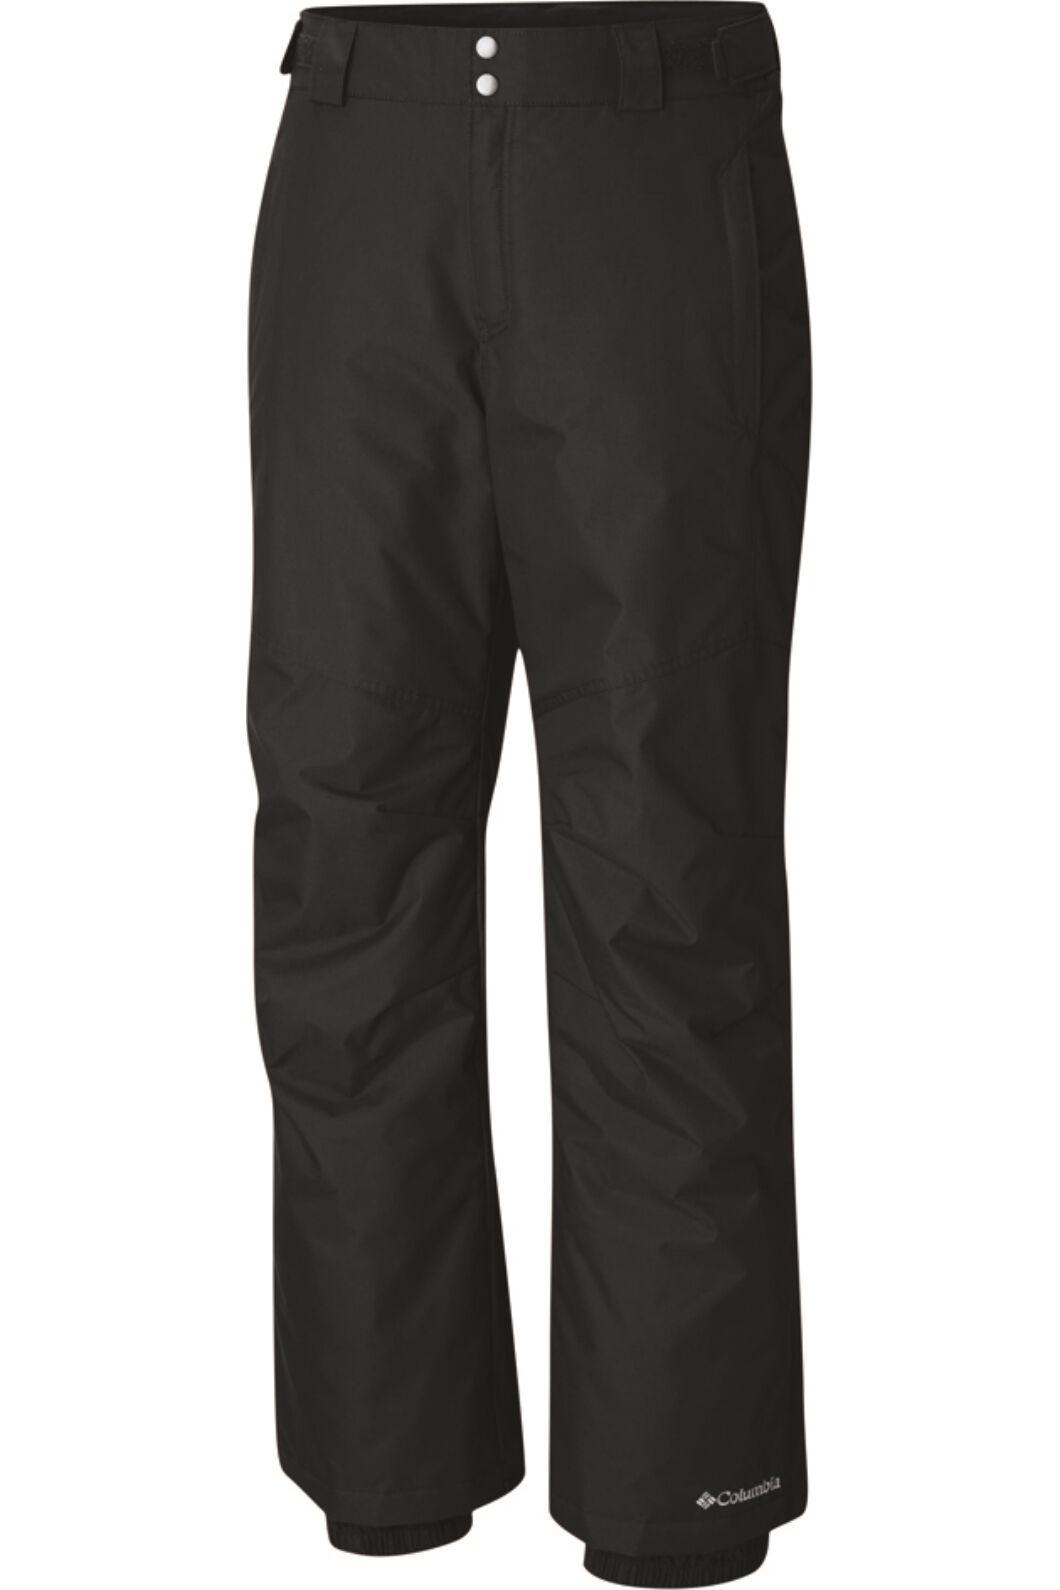 Columbia Men's Bugaboo II Pant, Black, hi-res